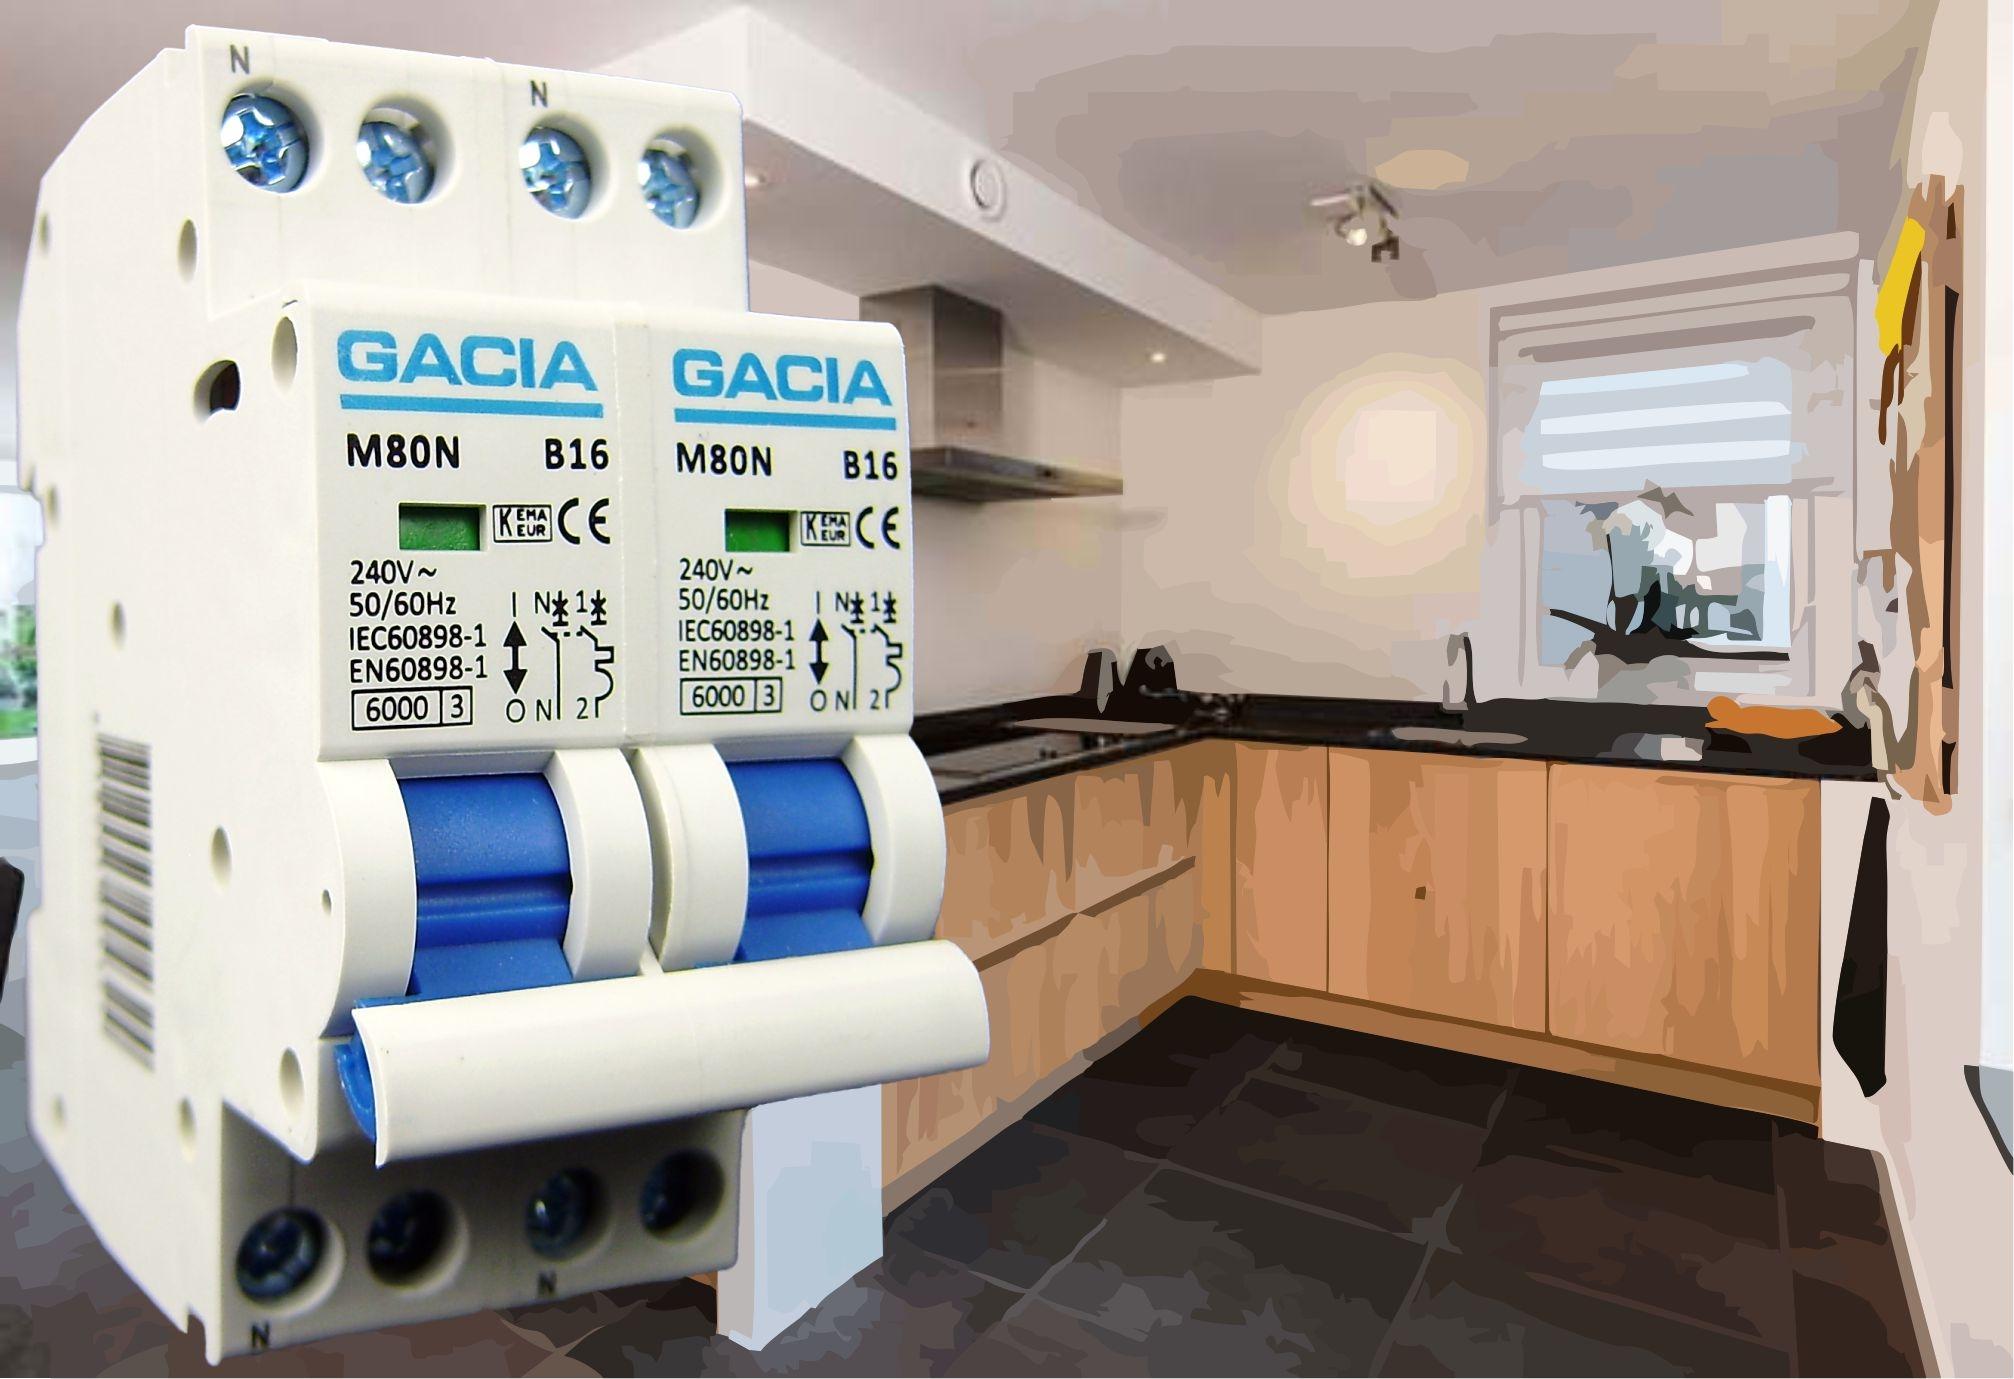 Gacia fornuisgroep